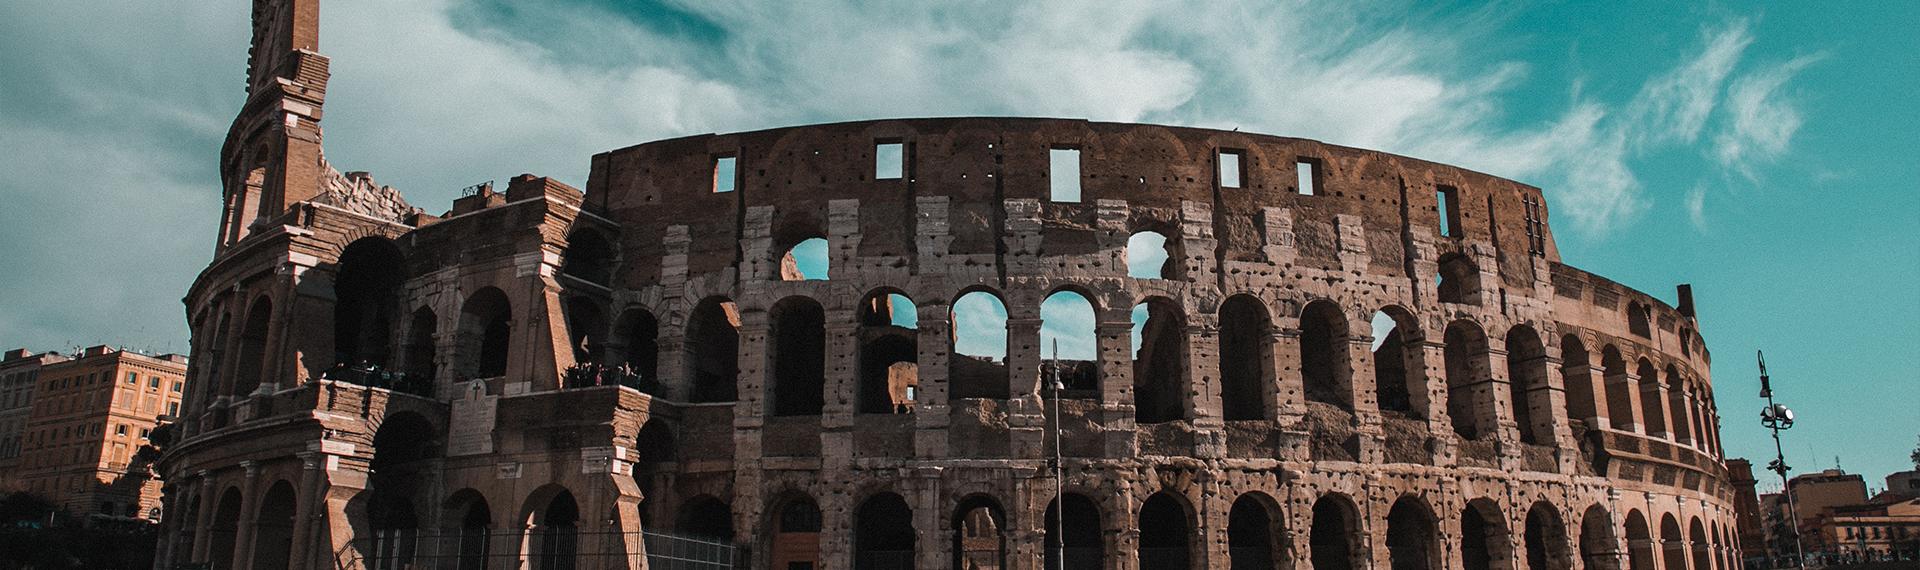 Colosseum | IATDMCT 2021 Rome